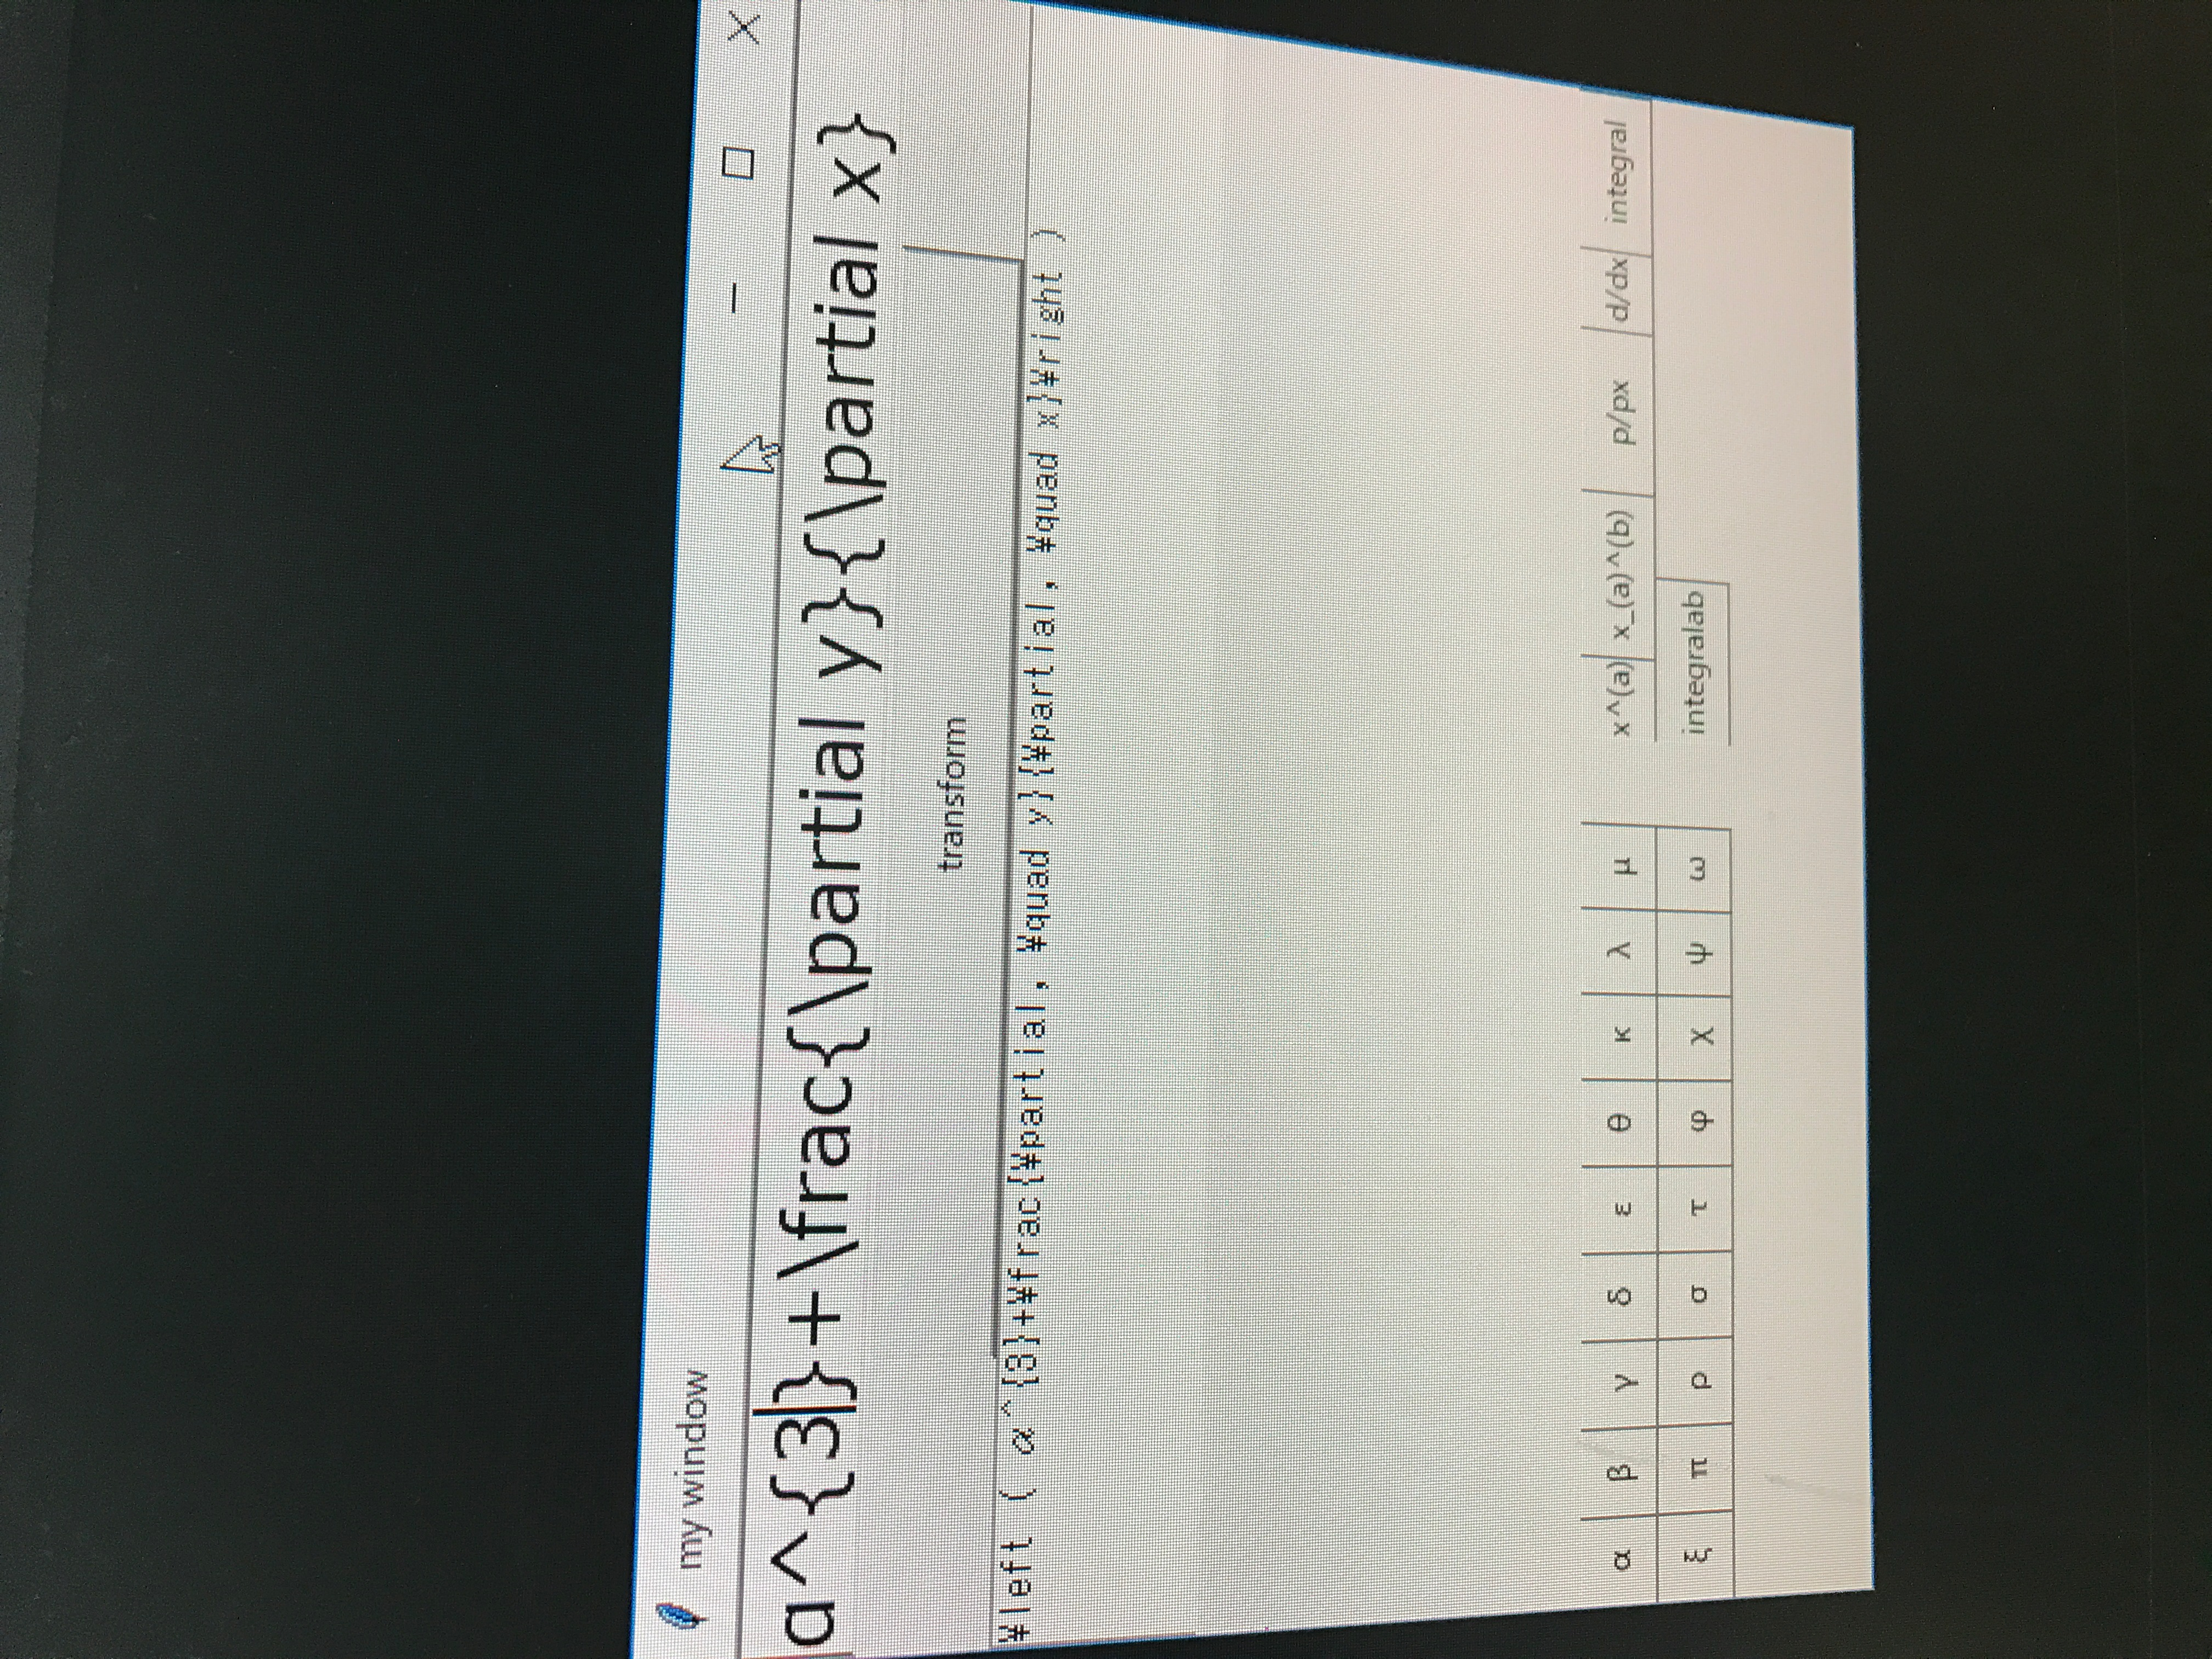 math editor for latex - 俊杰的博客